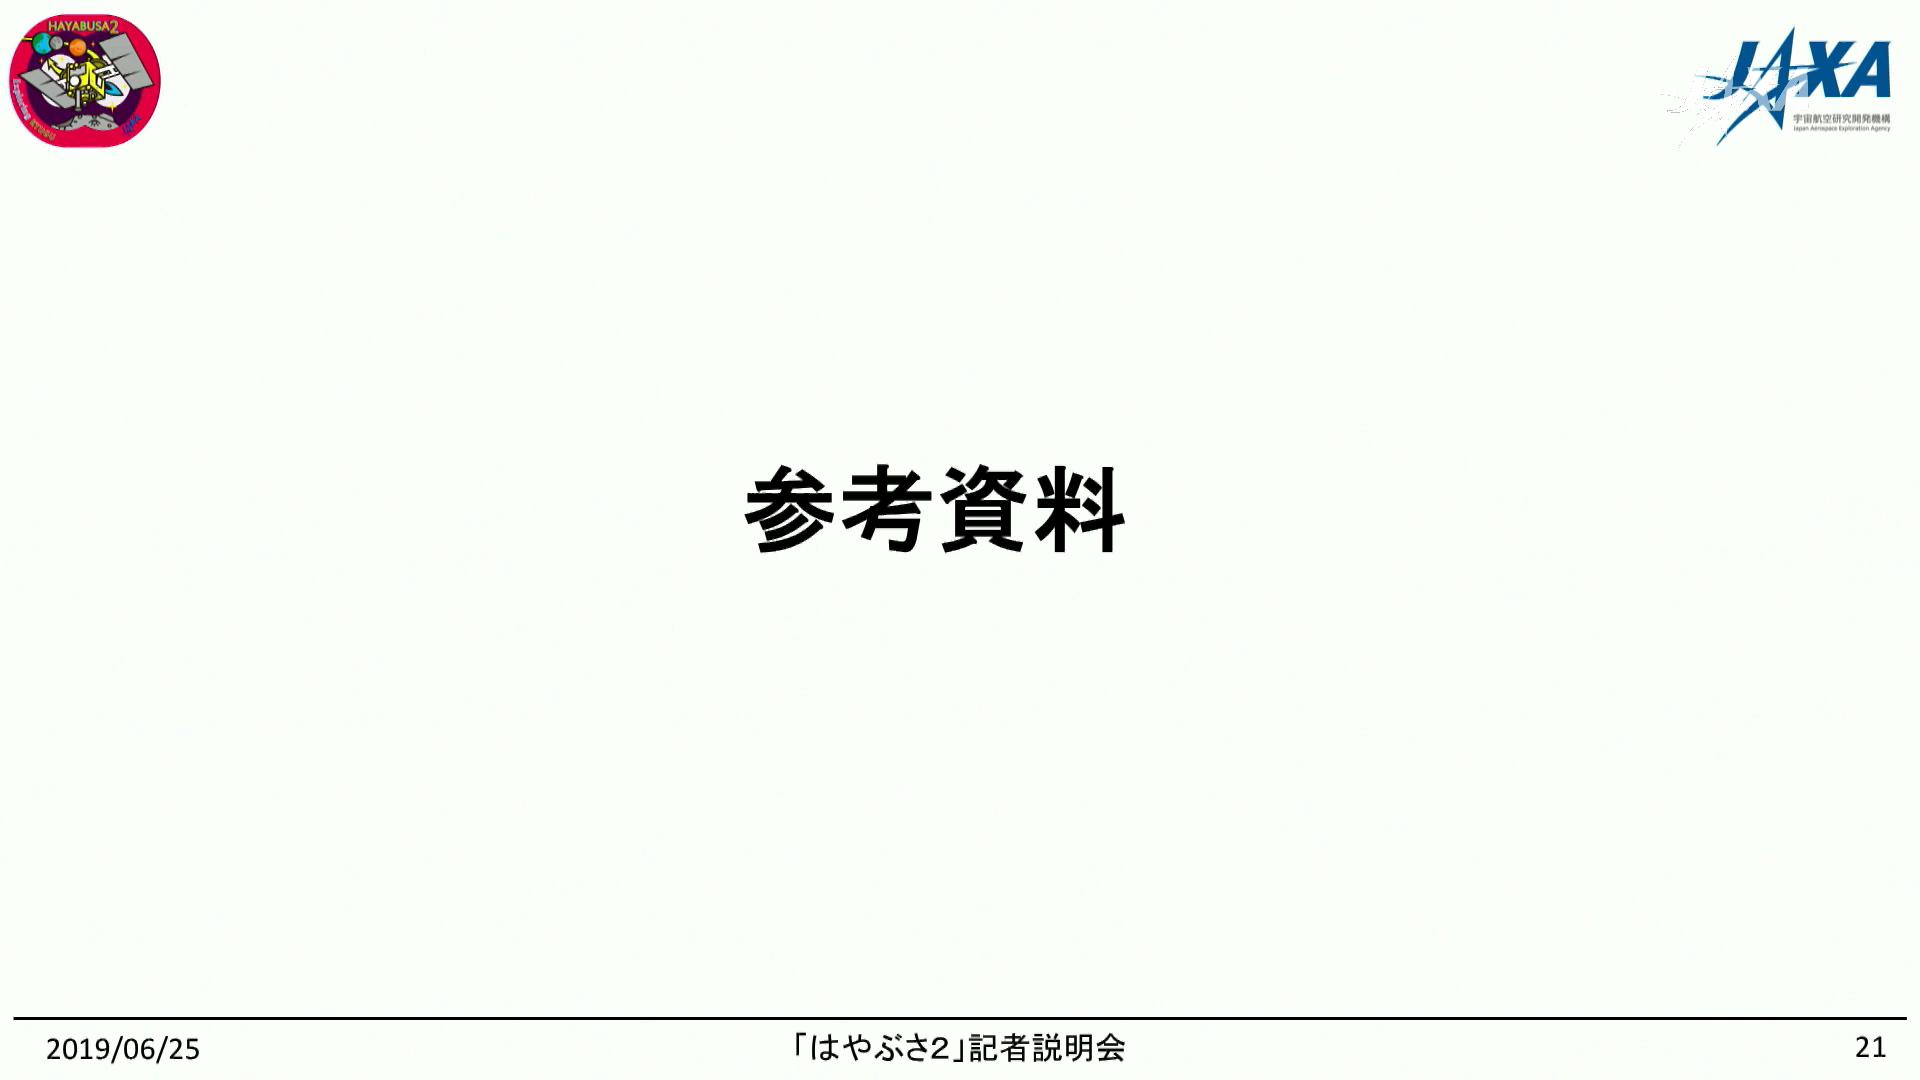 f:id:Imamura:20190625234848p:plain